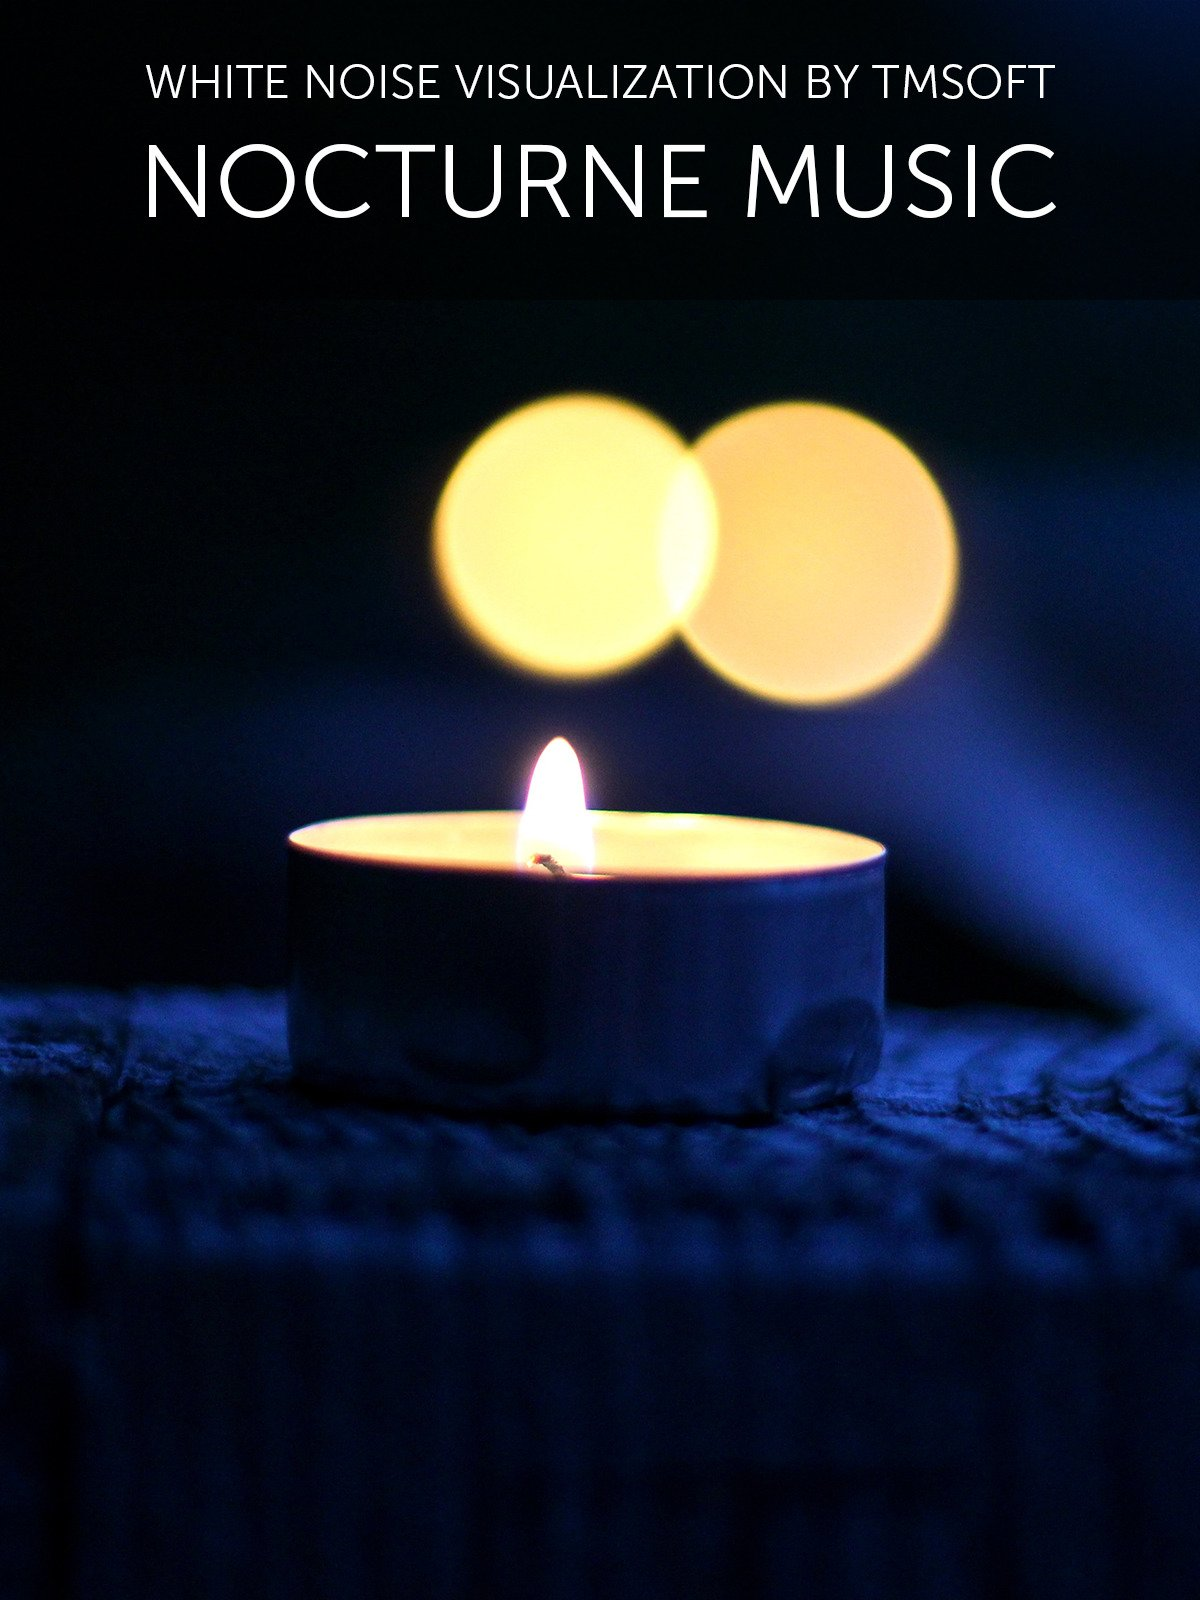 Nocturne Music